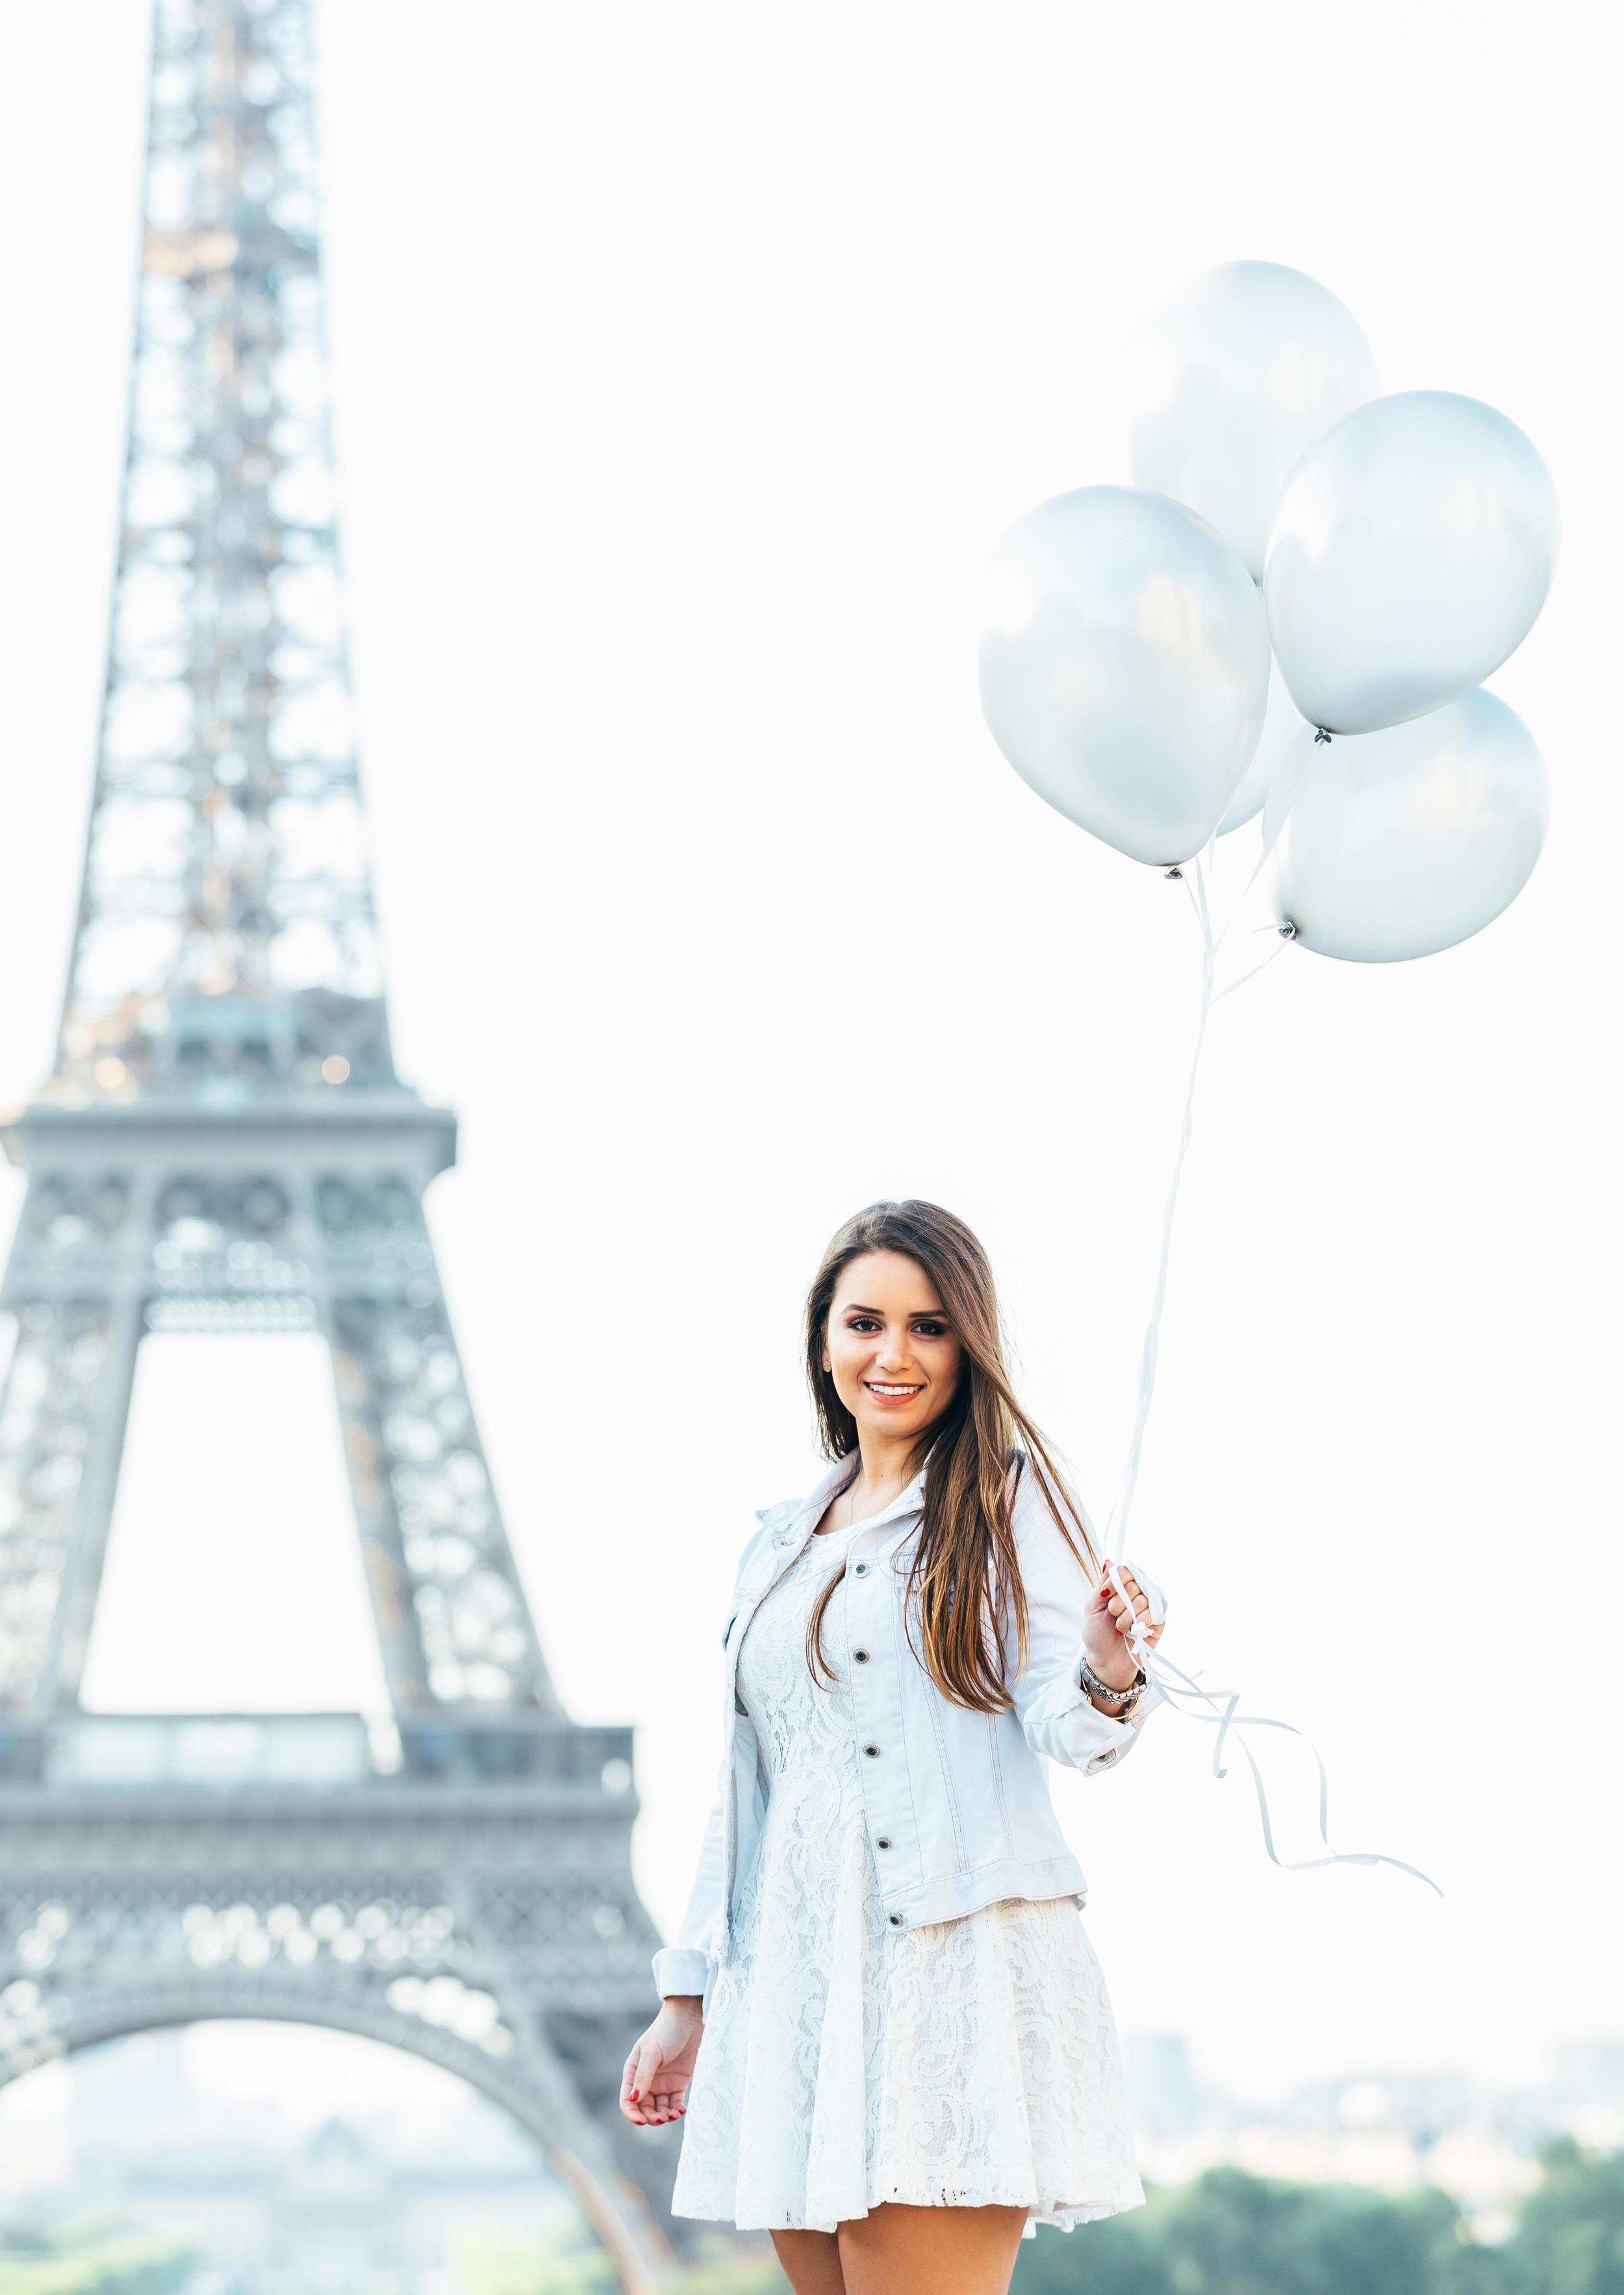 Photographer in Paris Eiffel Tower Lovestory Couple Trocadero balloons summer Iheartparisfr